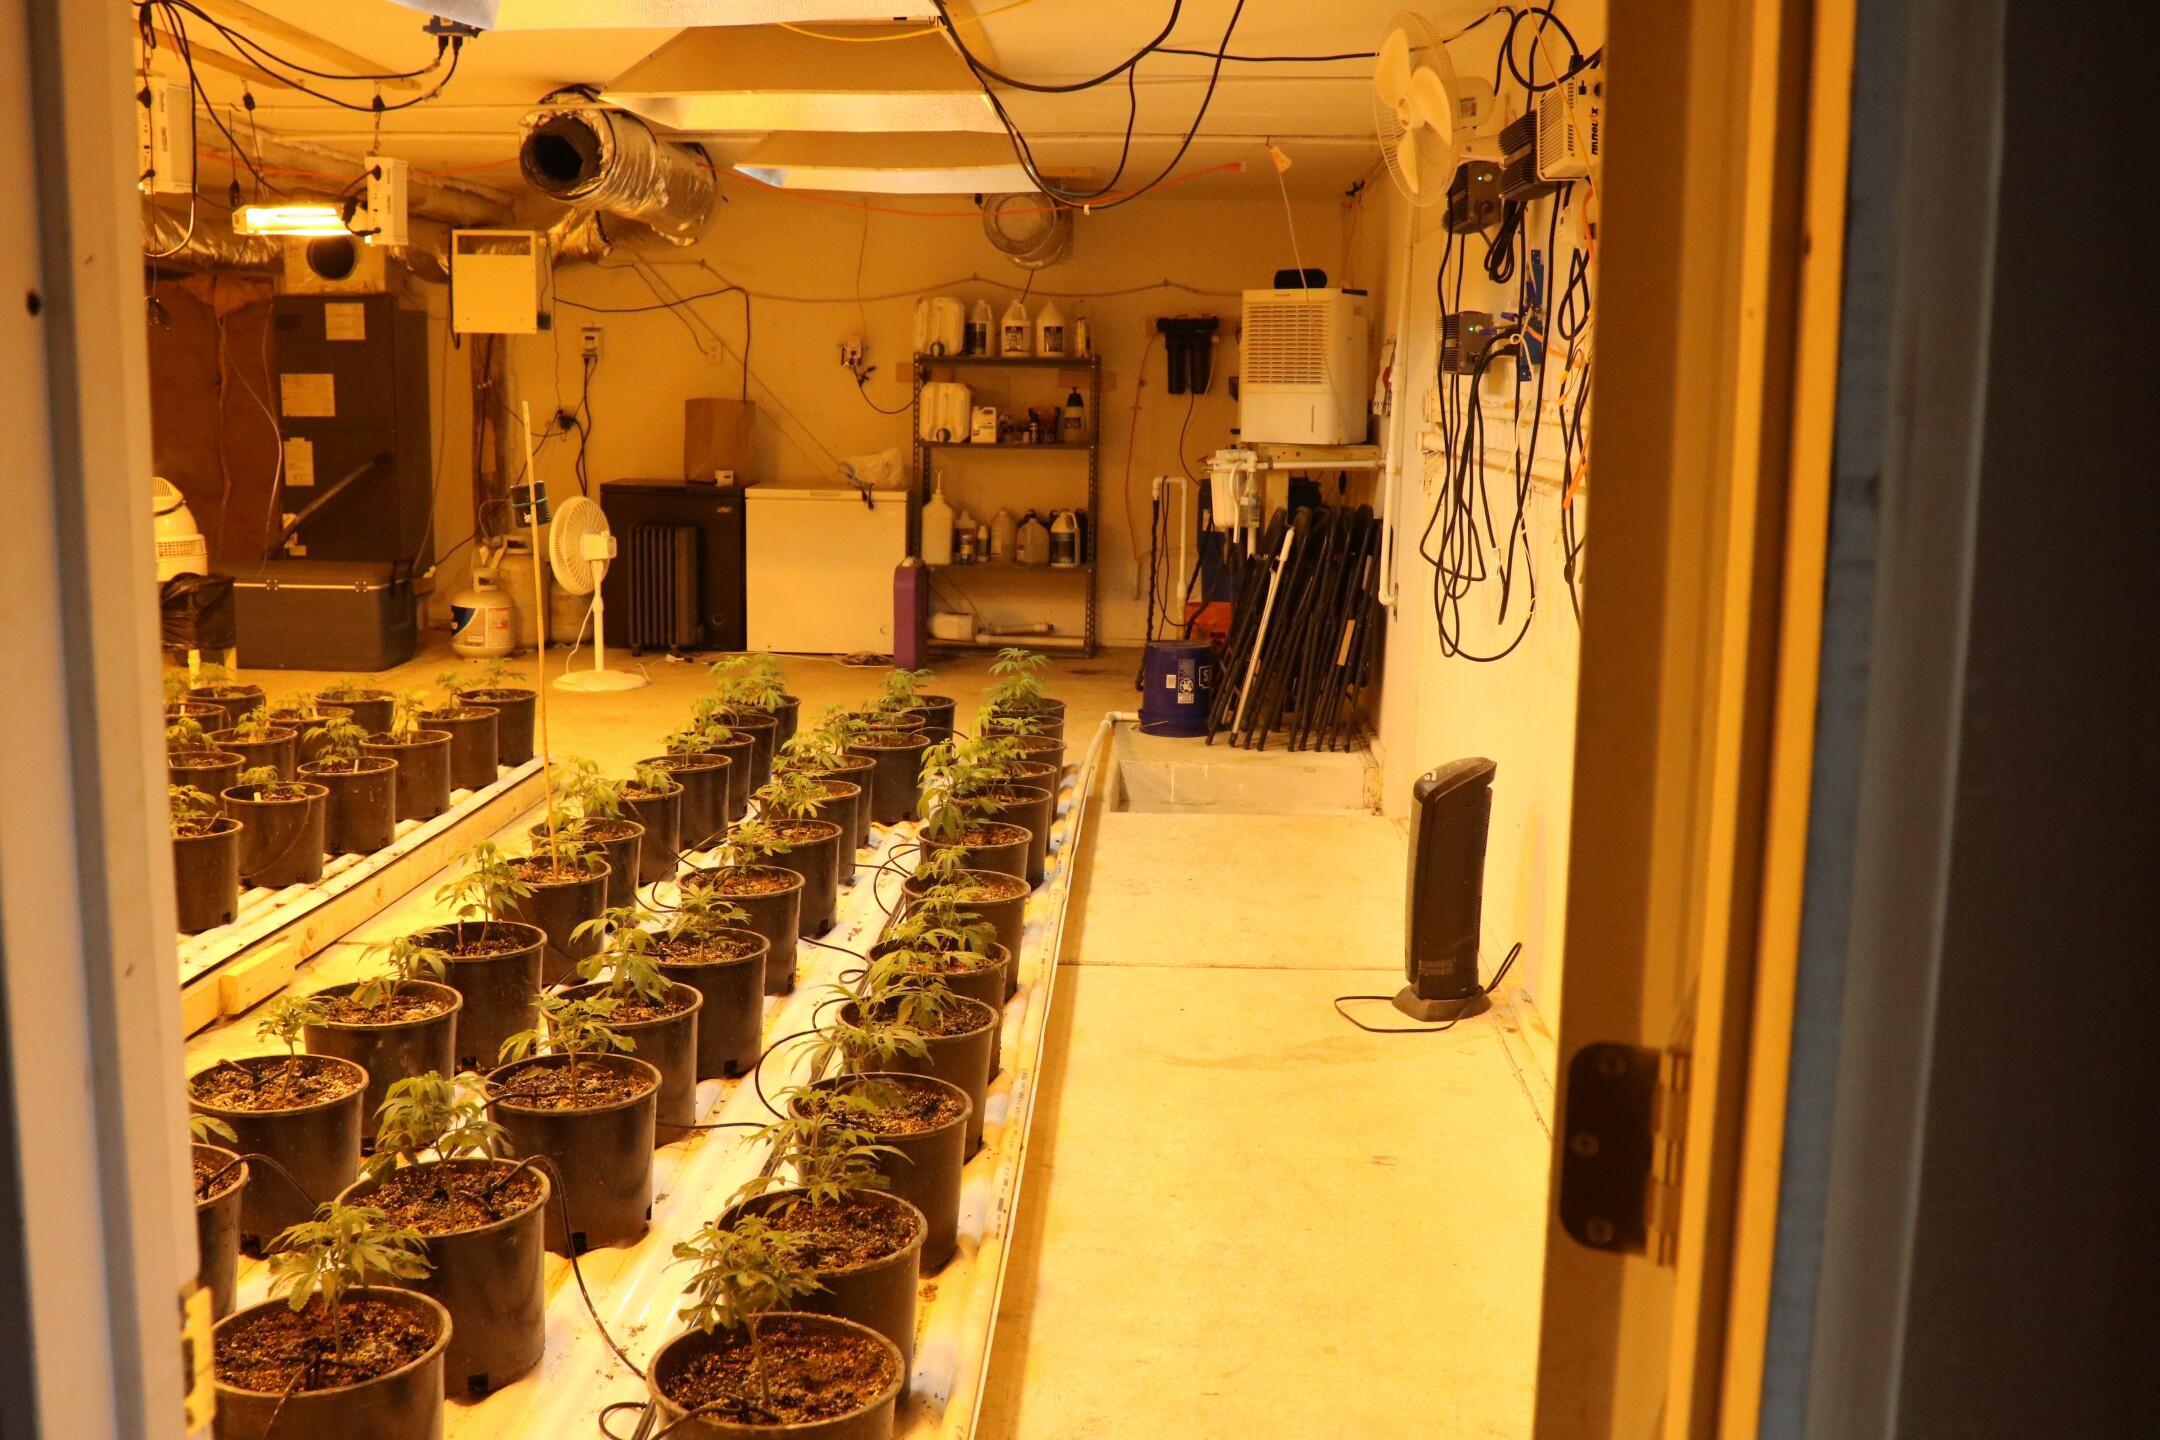 Marijuana grow operation